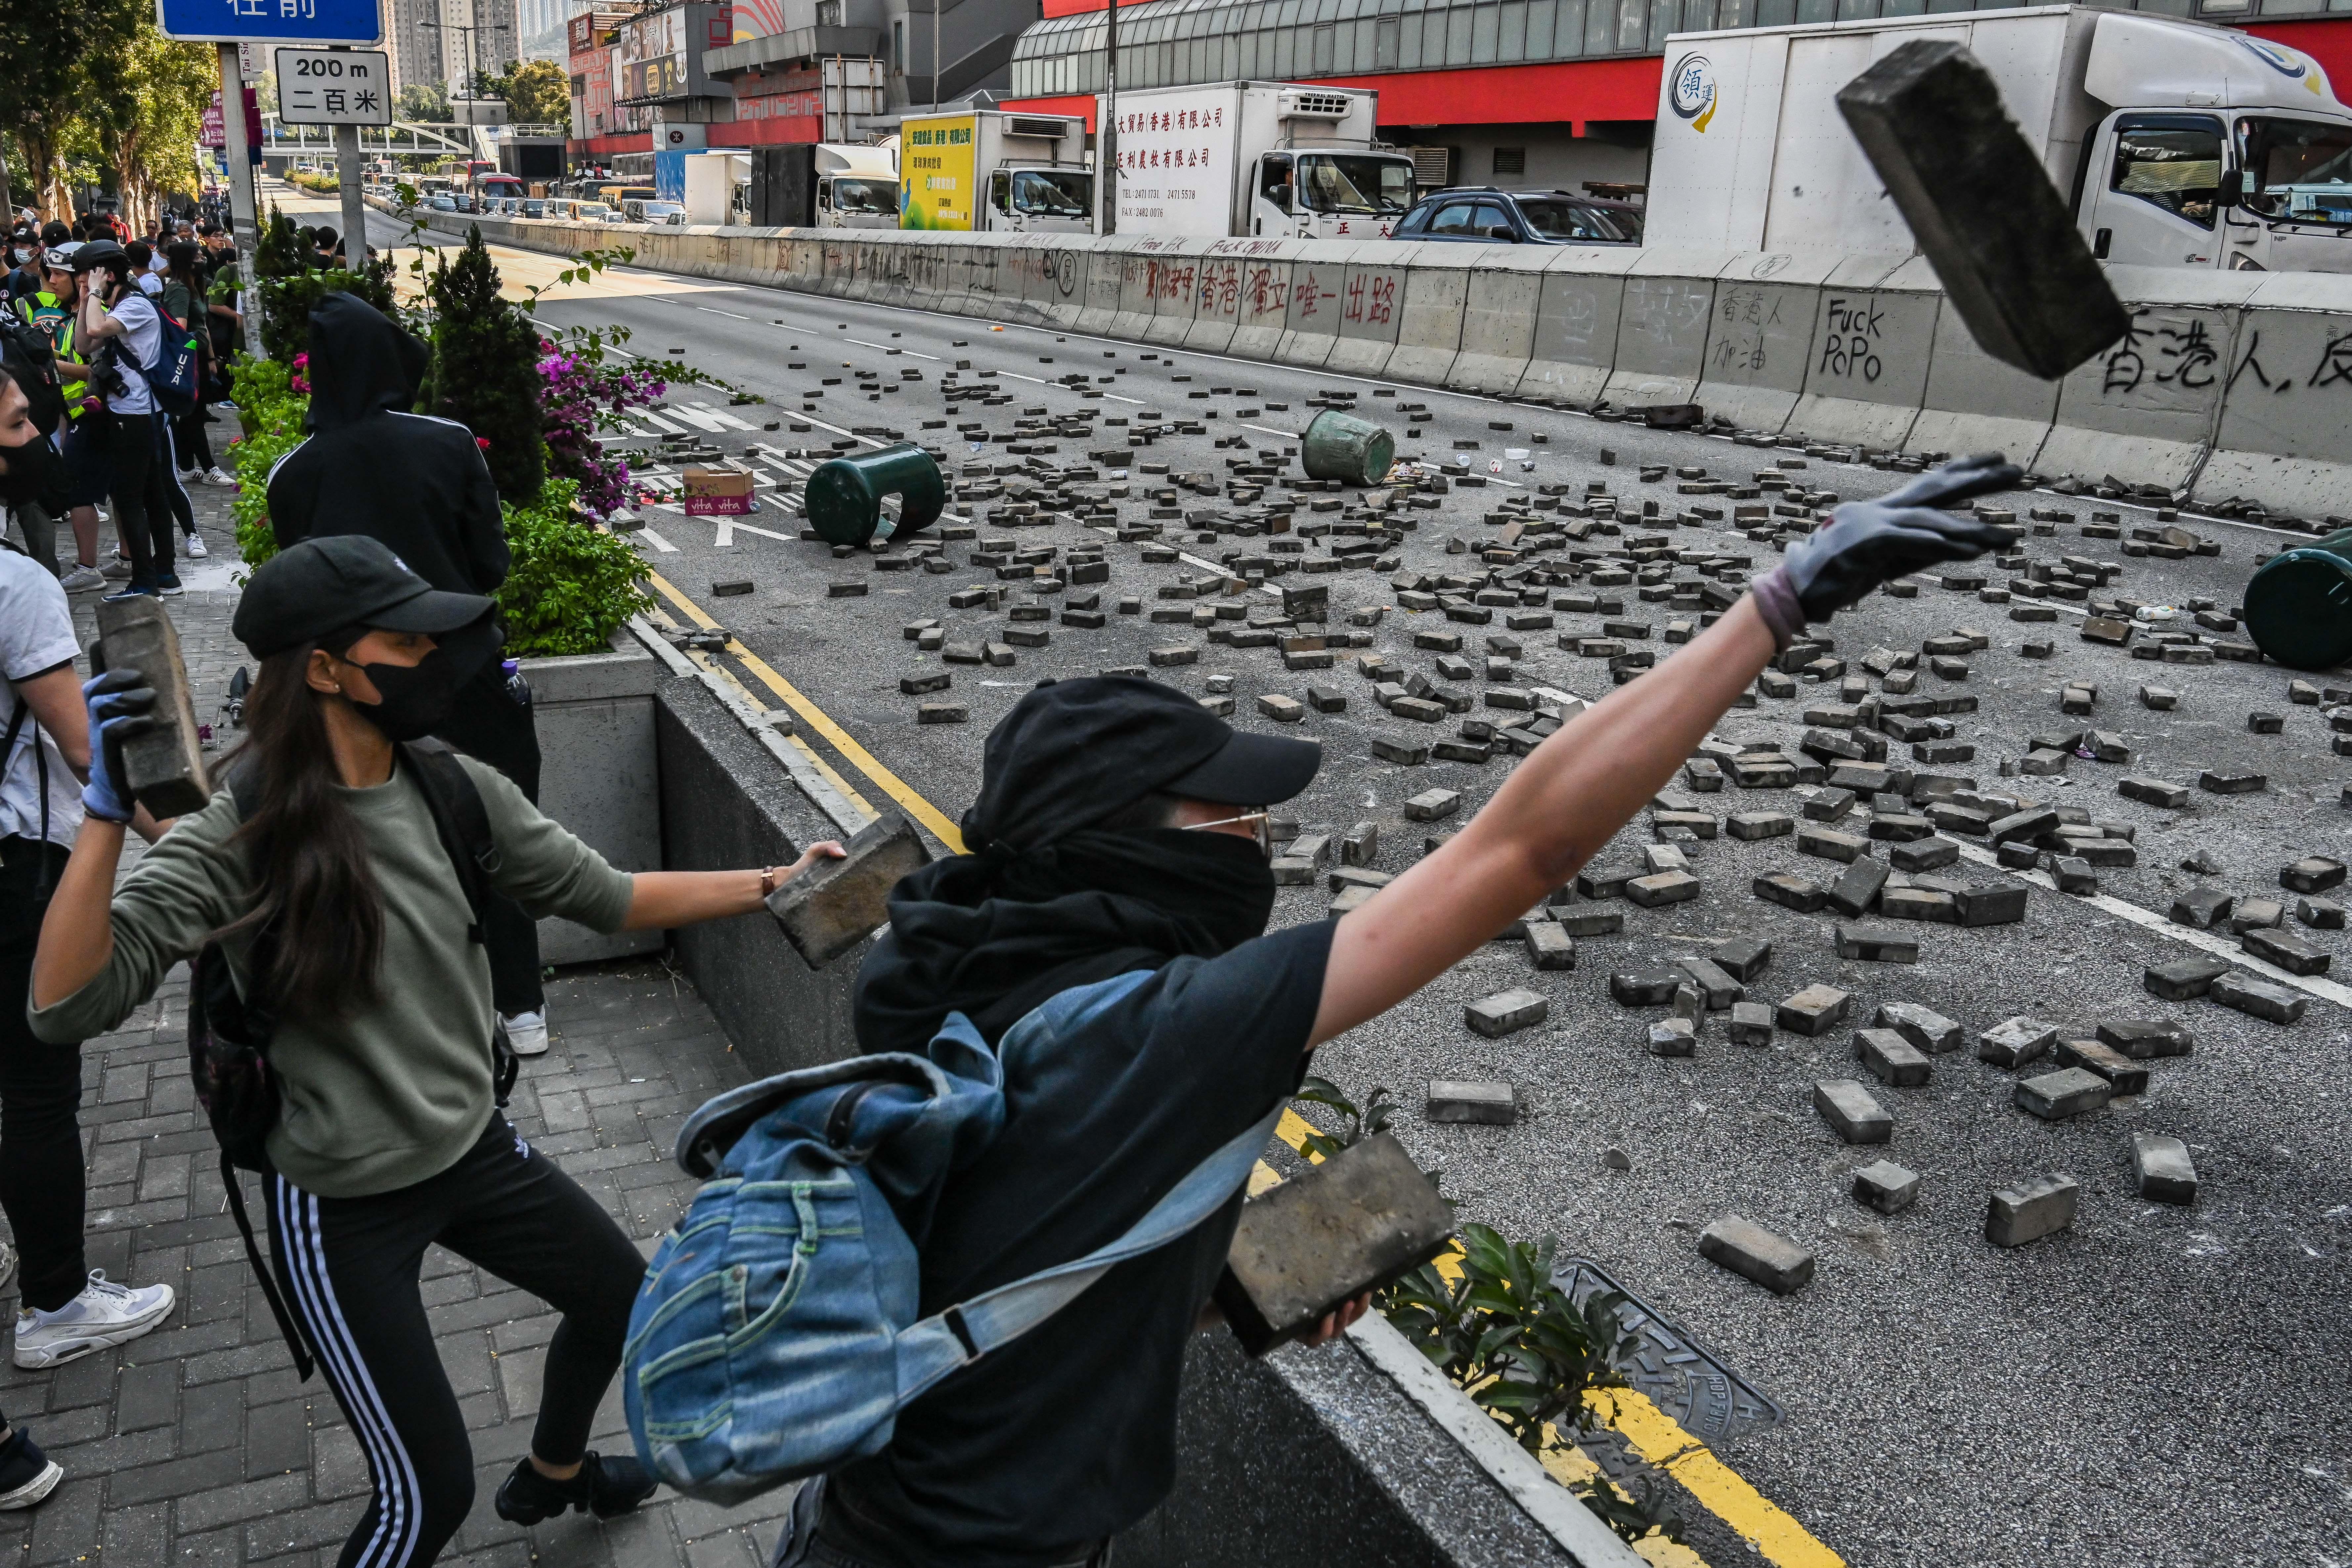 Protestors throw bricks to the road in Wong Tai Sin district on November 11, 2019 in Hong Kong.